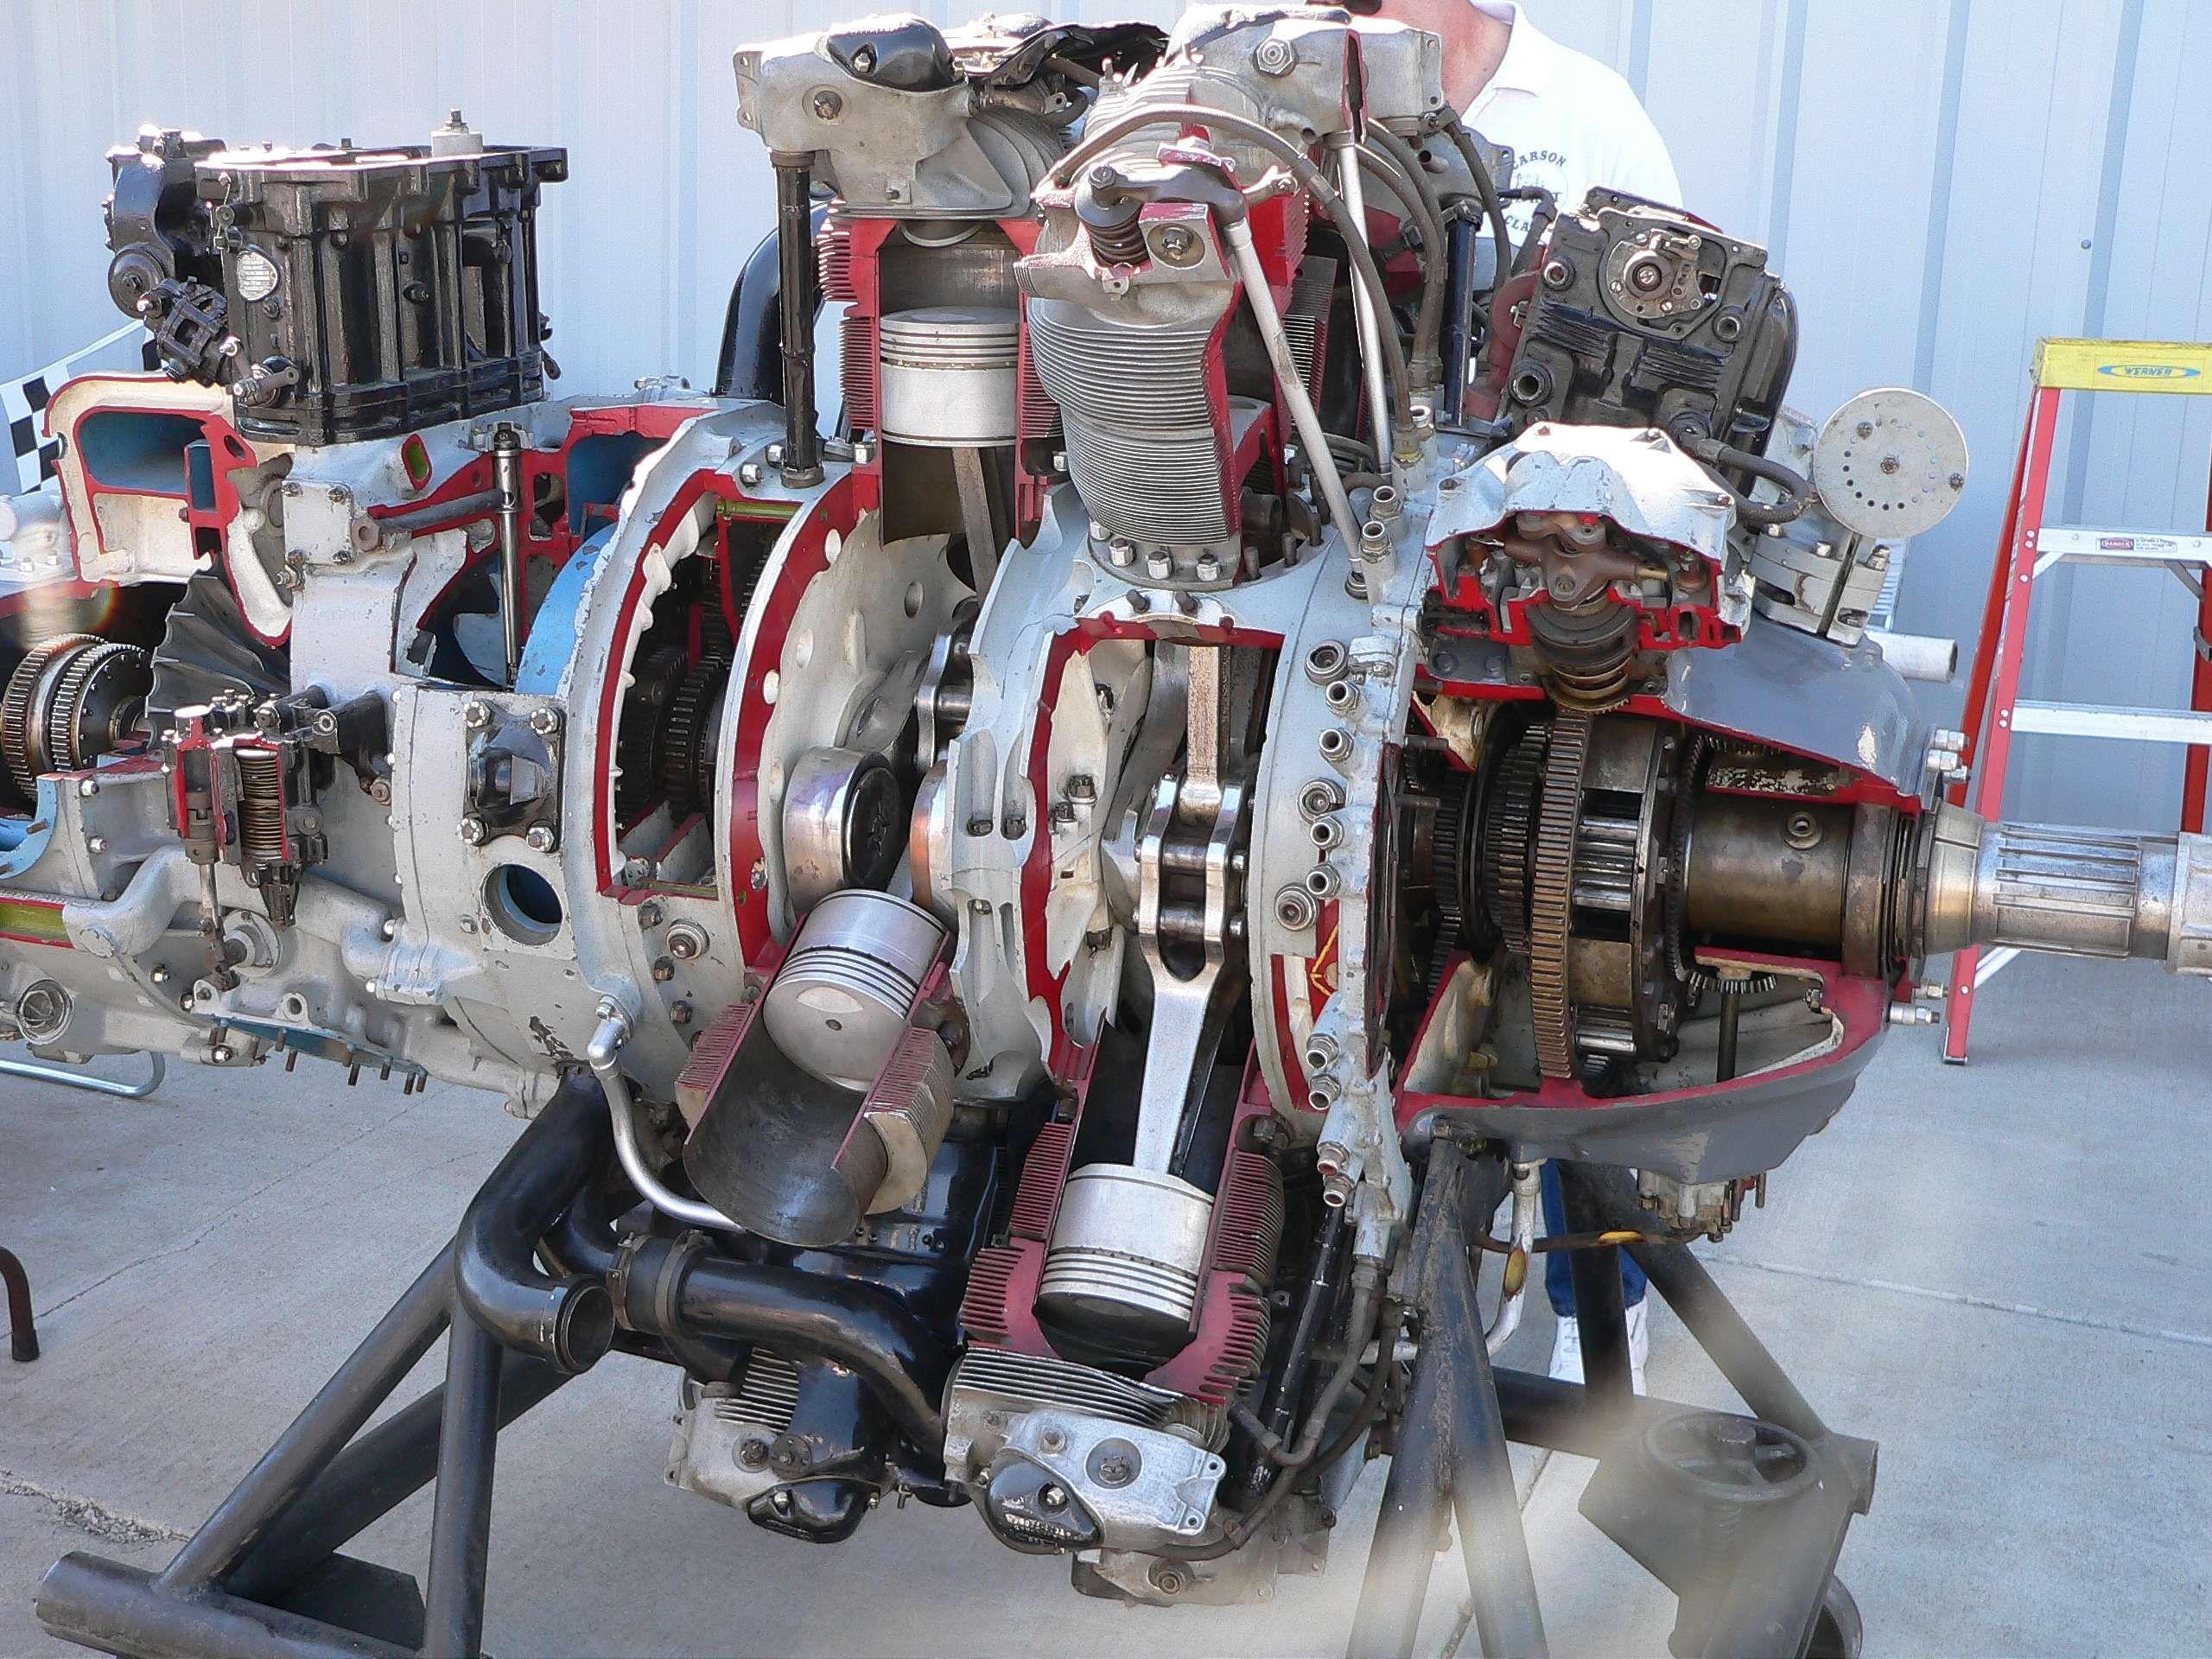 Radial Engines Motorcycles  Ccafdaf